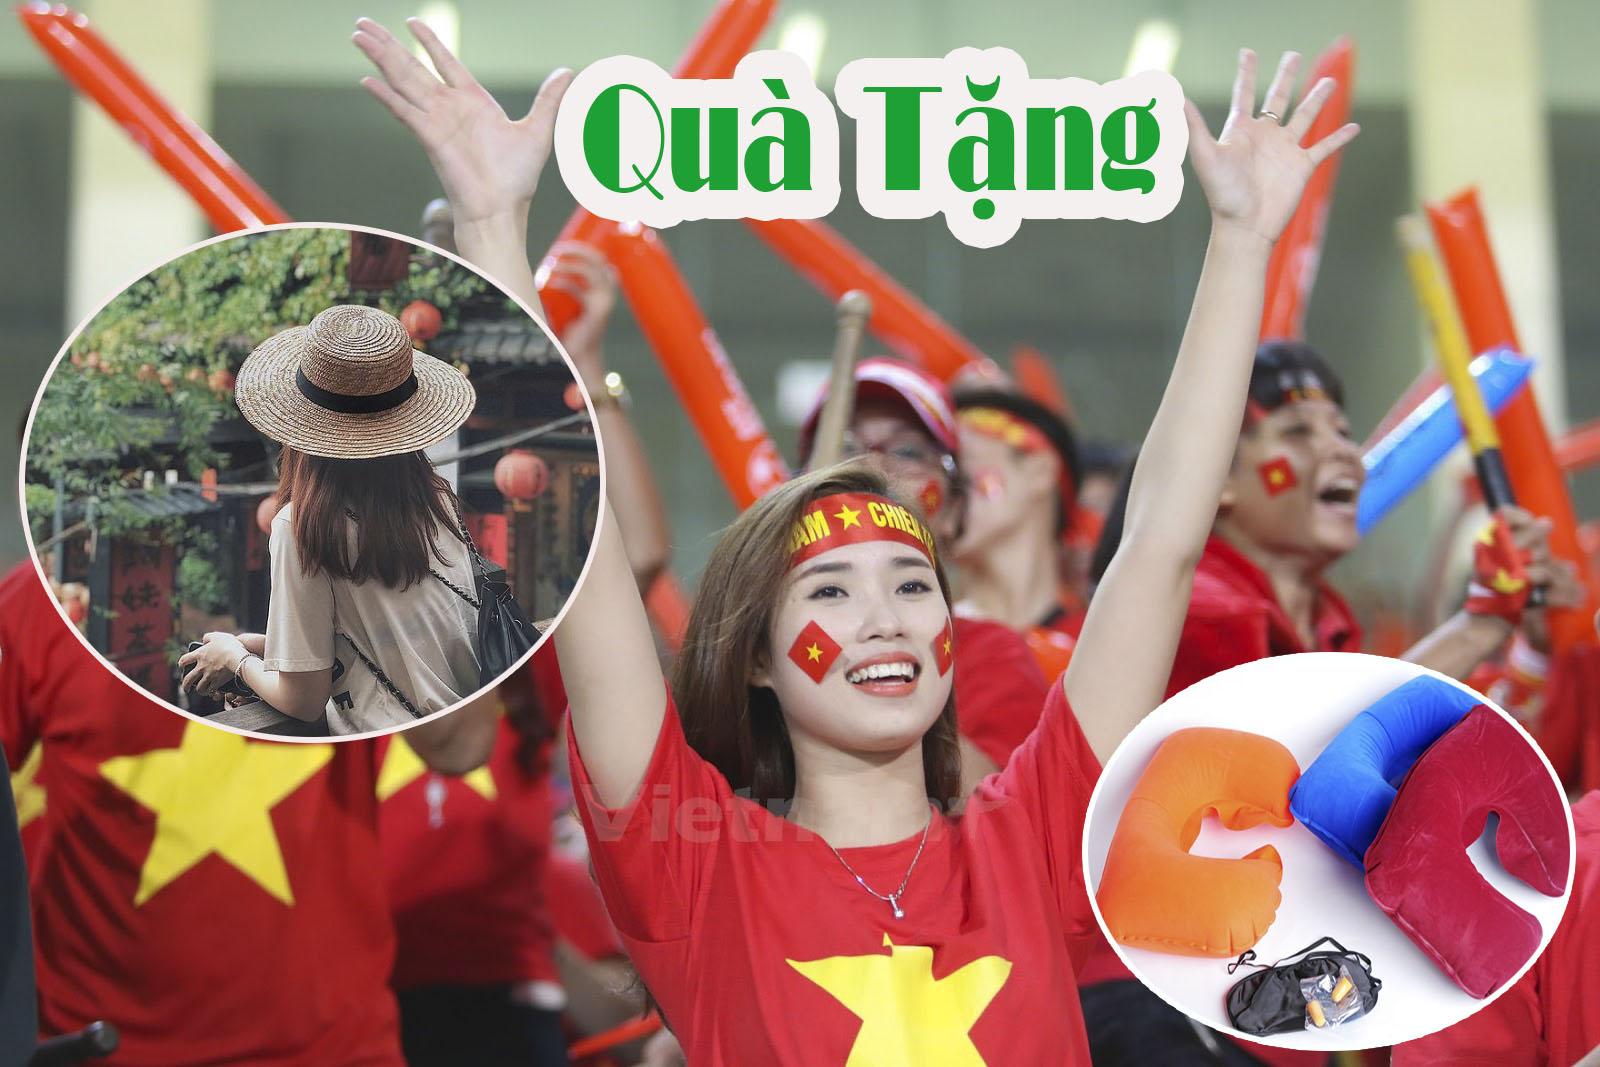 qua-tang-vietmountain-travel1